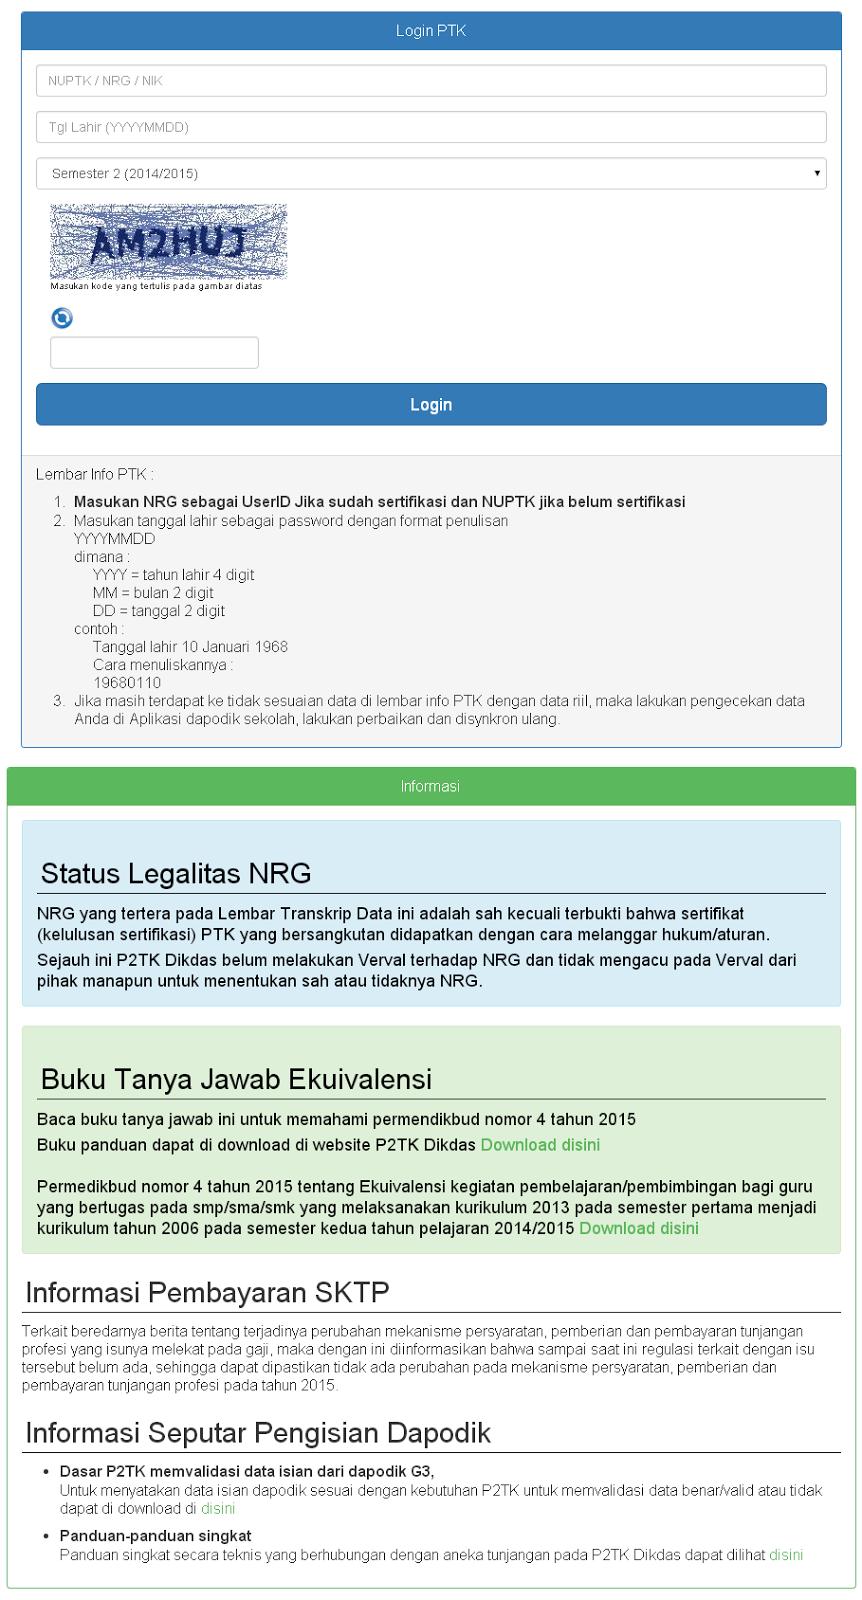 Cek Info PTK 2015